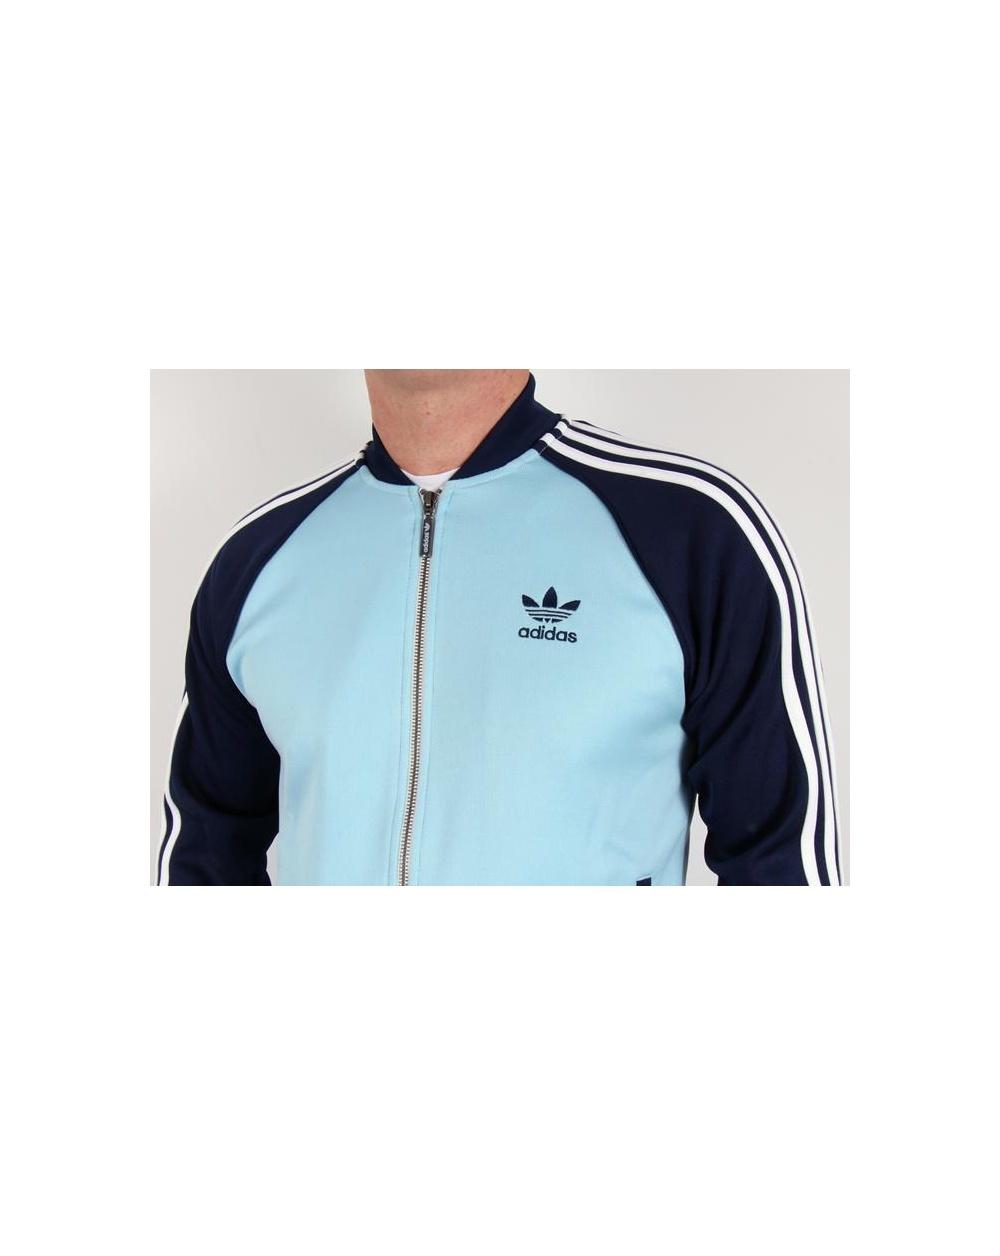 Adidas Originals Superstar Pista Superiore Arrossire Blu / Navy xSj4C7Ha